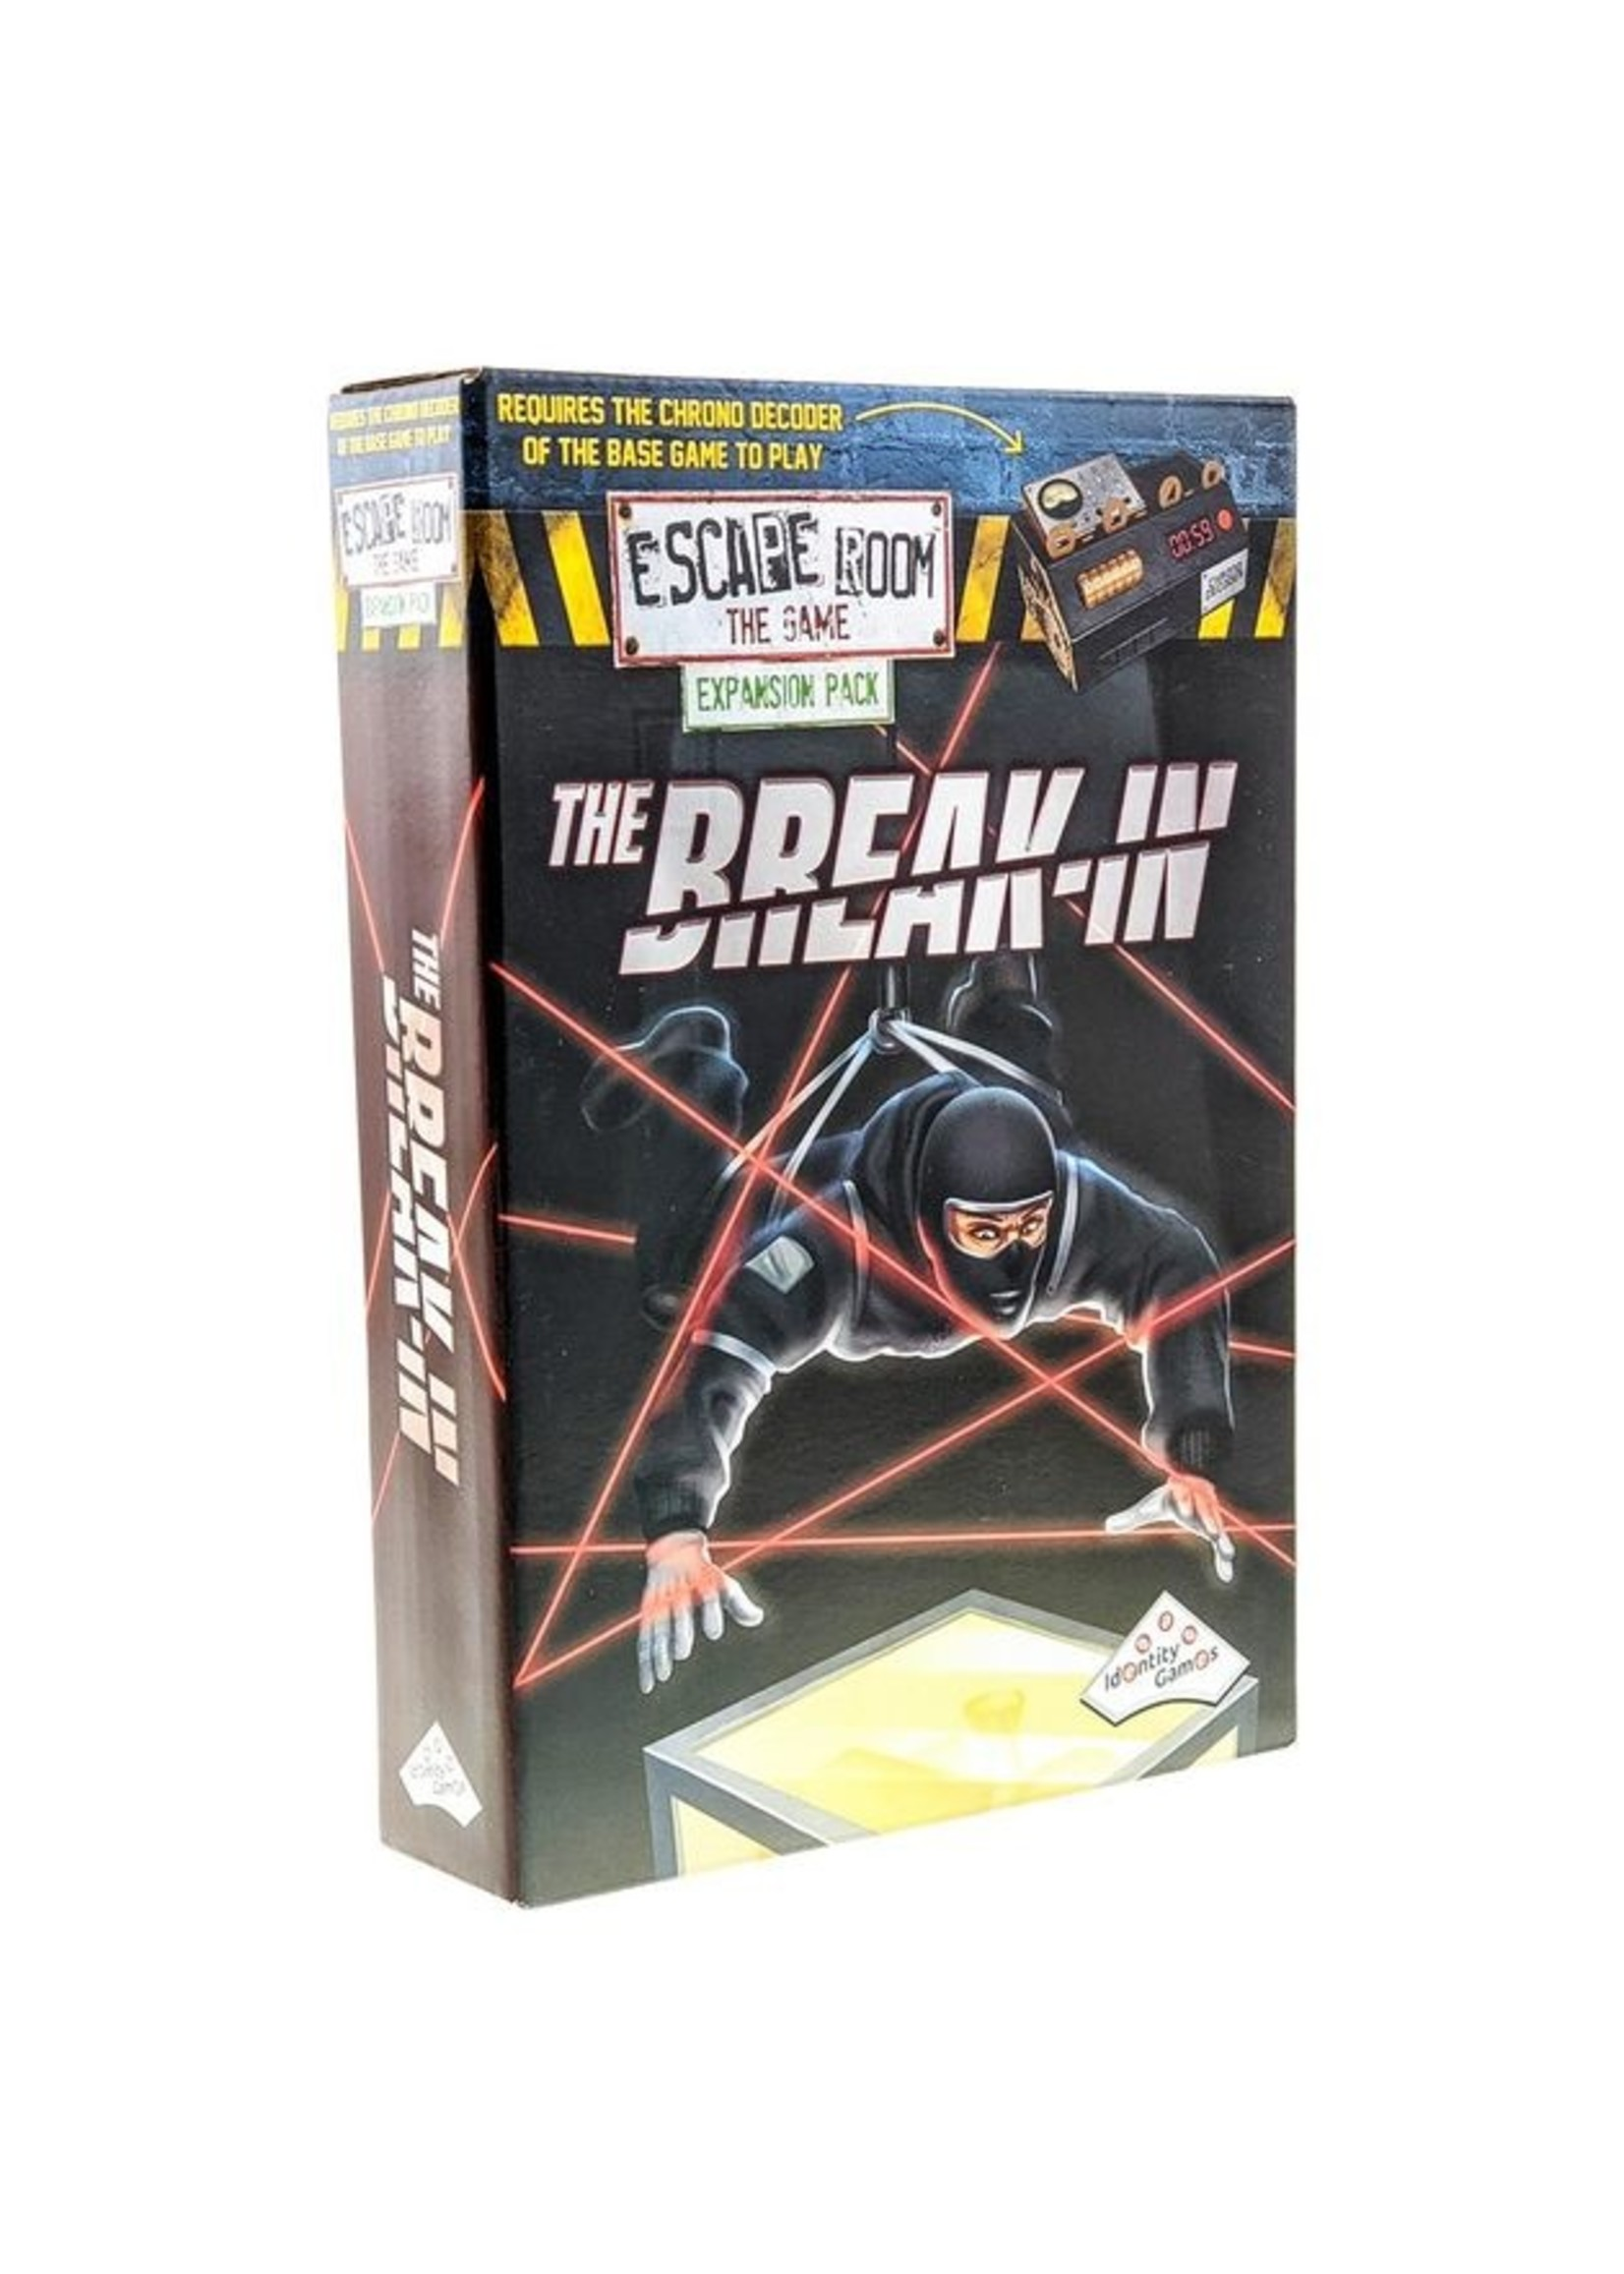 Escape room the game - The Break in